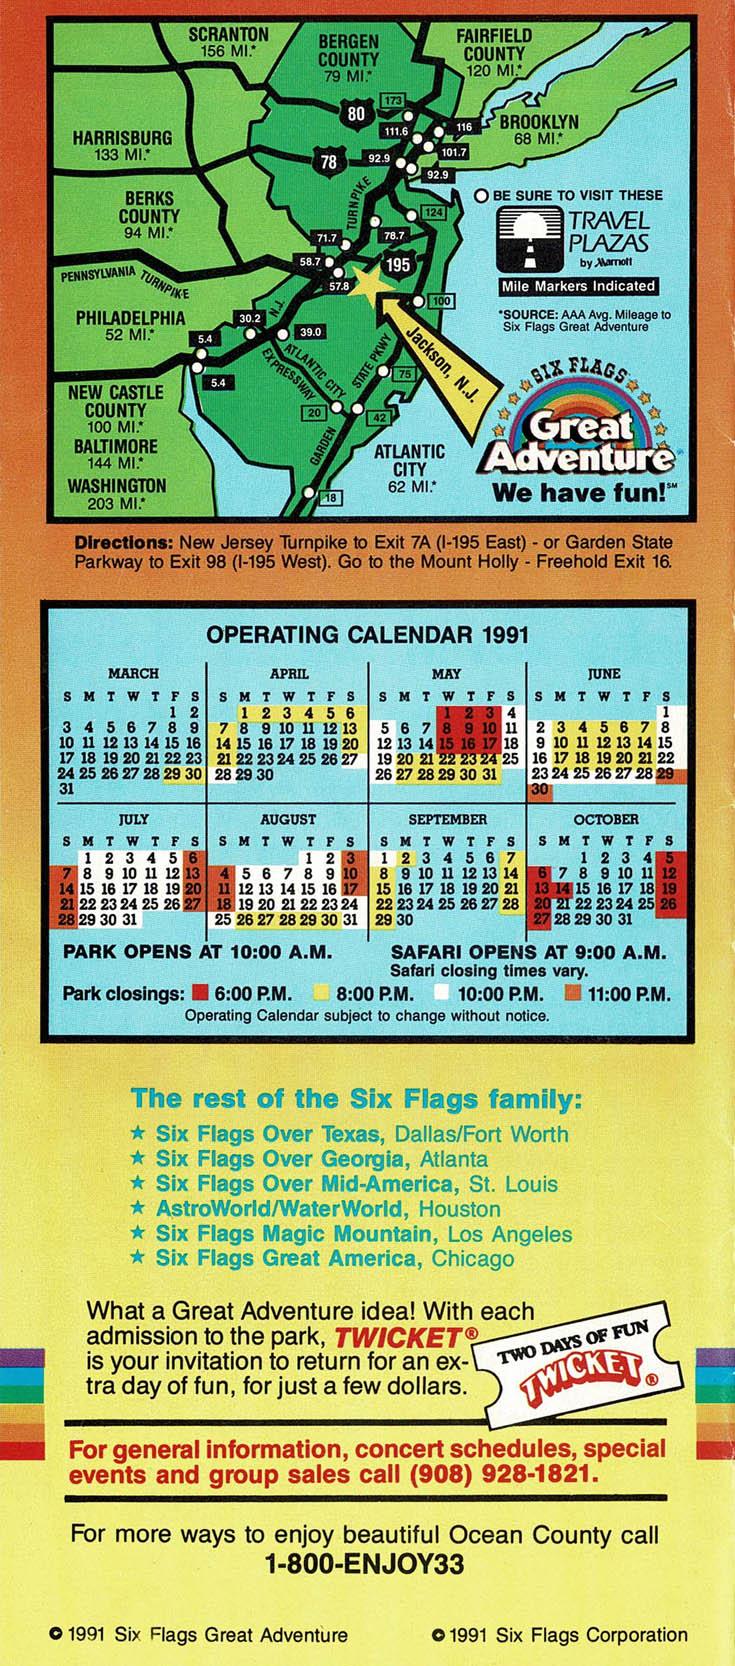 Great Adventure History 1991 Brochure